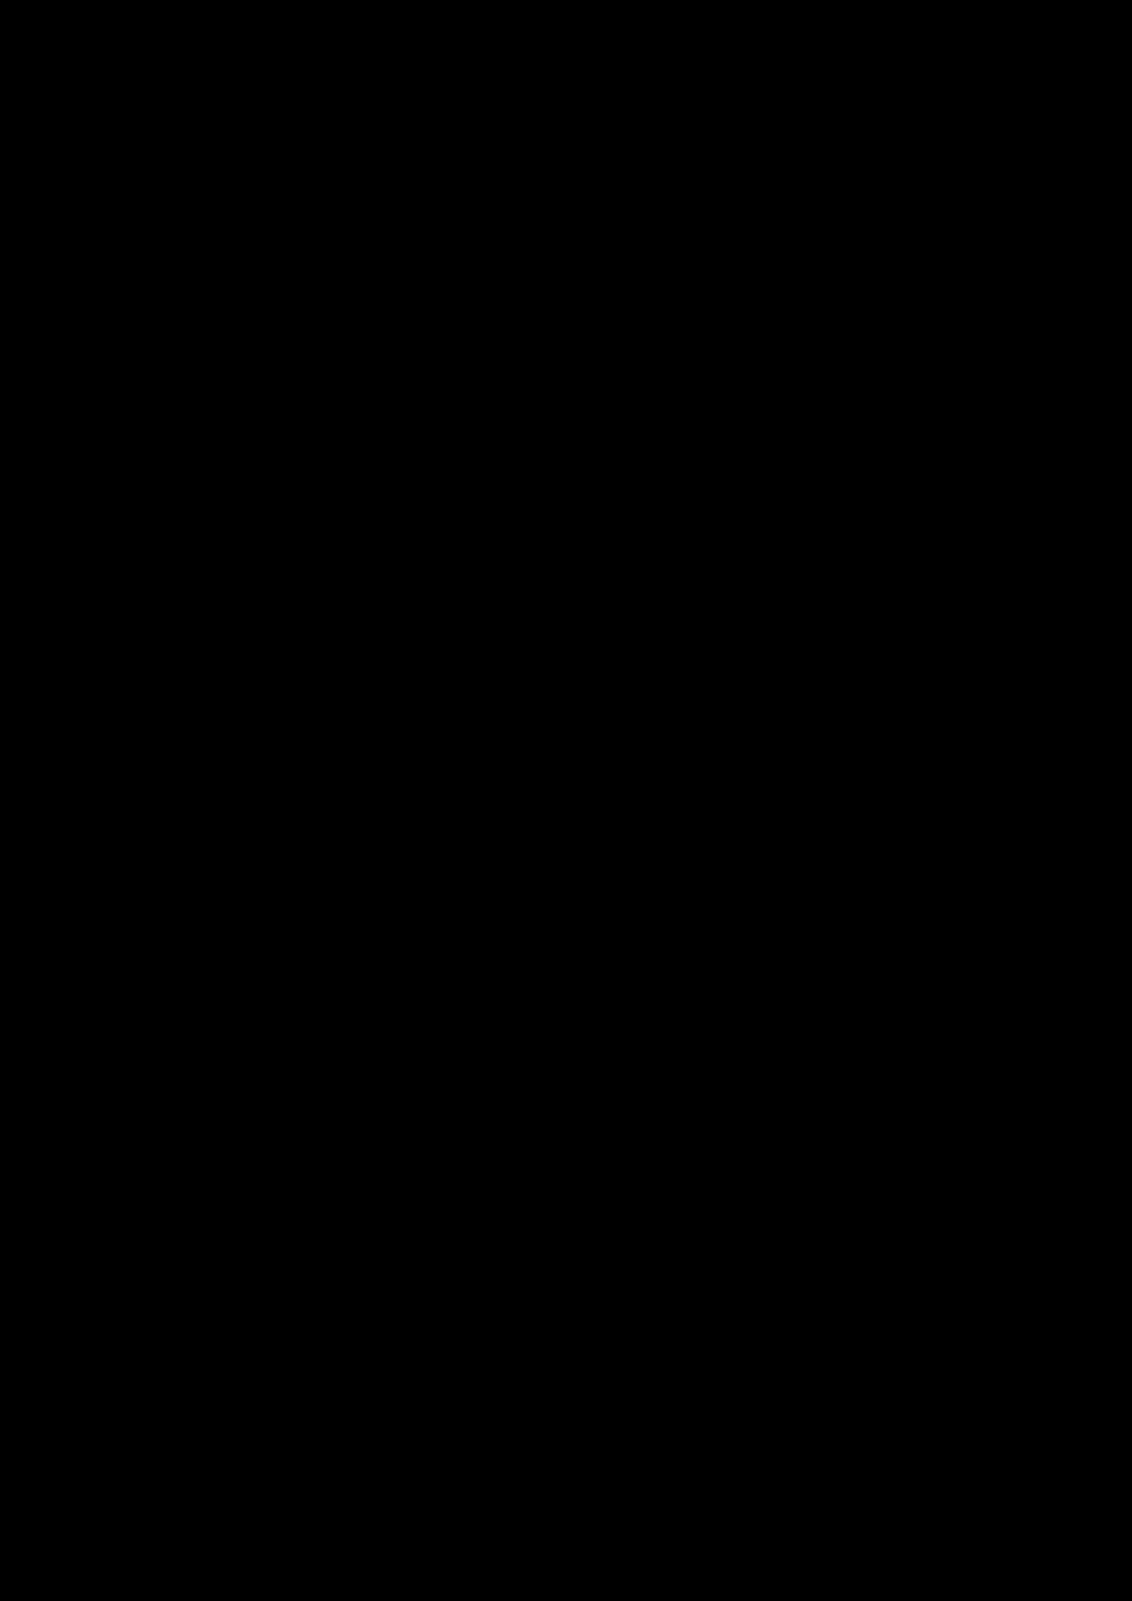 Ten lyubvi slide, Image 52